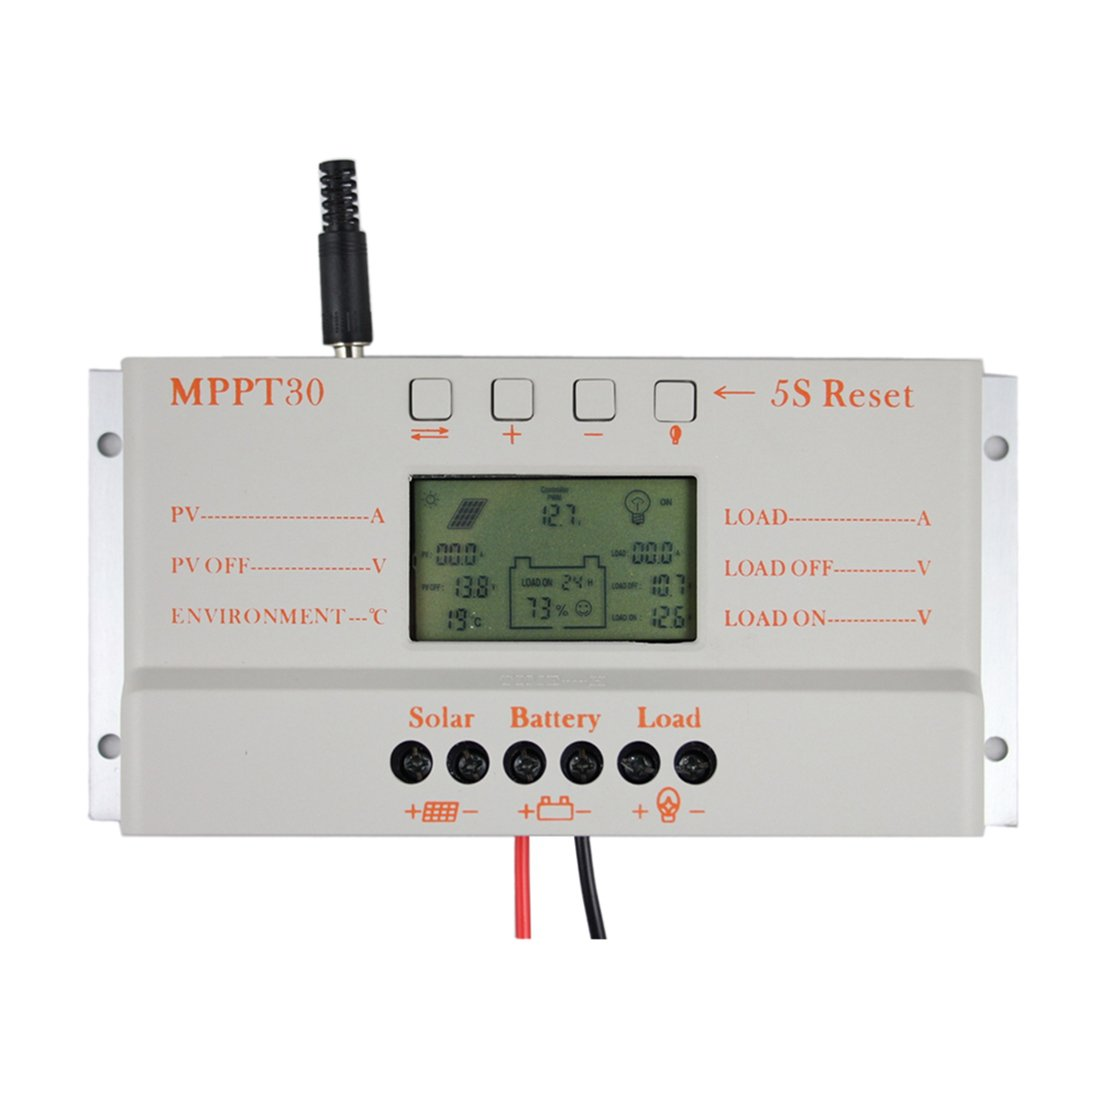 Y&H 30A Solar Charge Controller 12V 24V MPPT Charge Controller Battery Intelligent Regulator Temperature Compensation Dual Timer LCD Display USB 5V【Not True MPPT,Compatible MPPT + PWM Charging Mode】